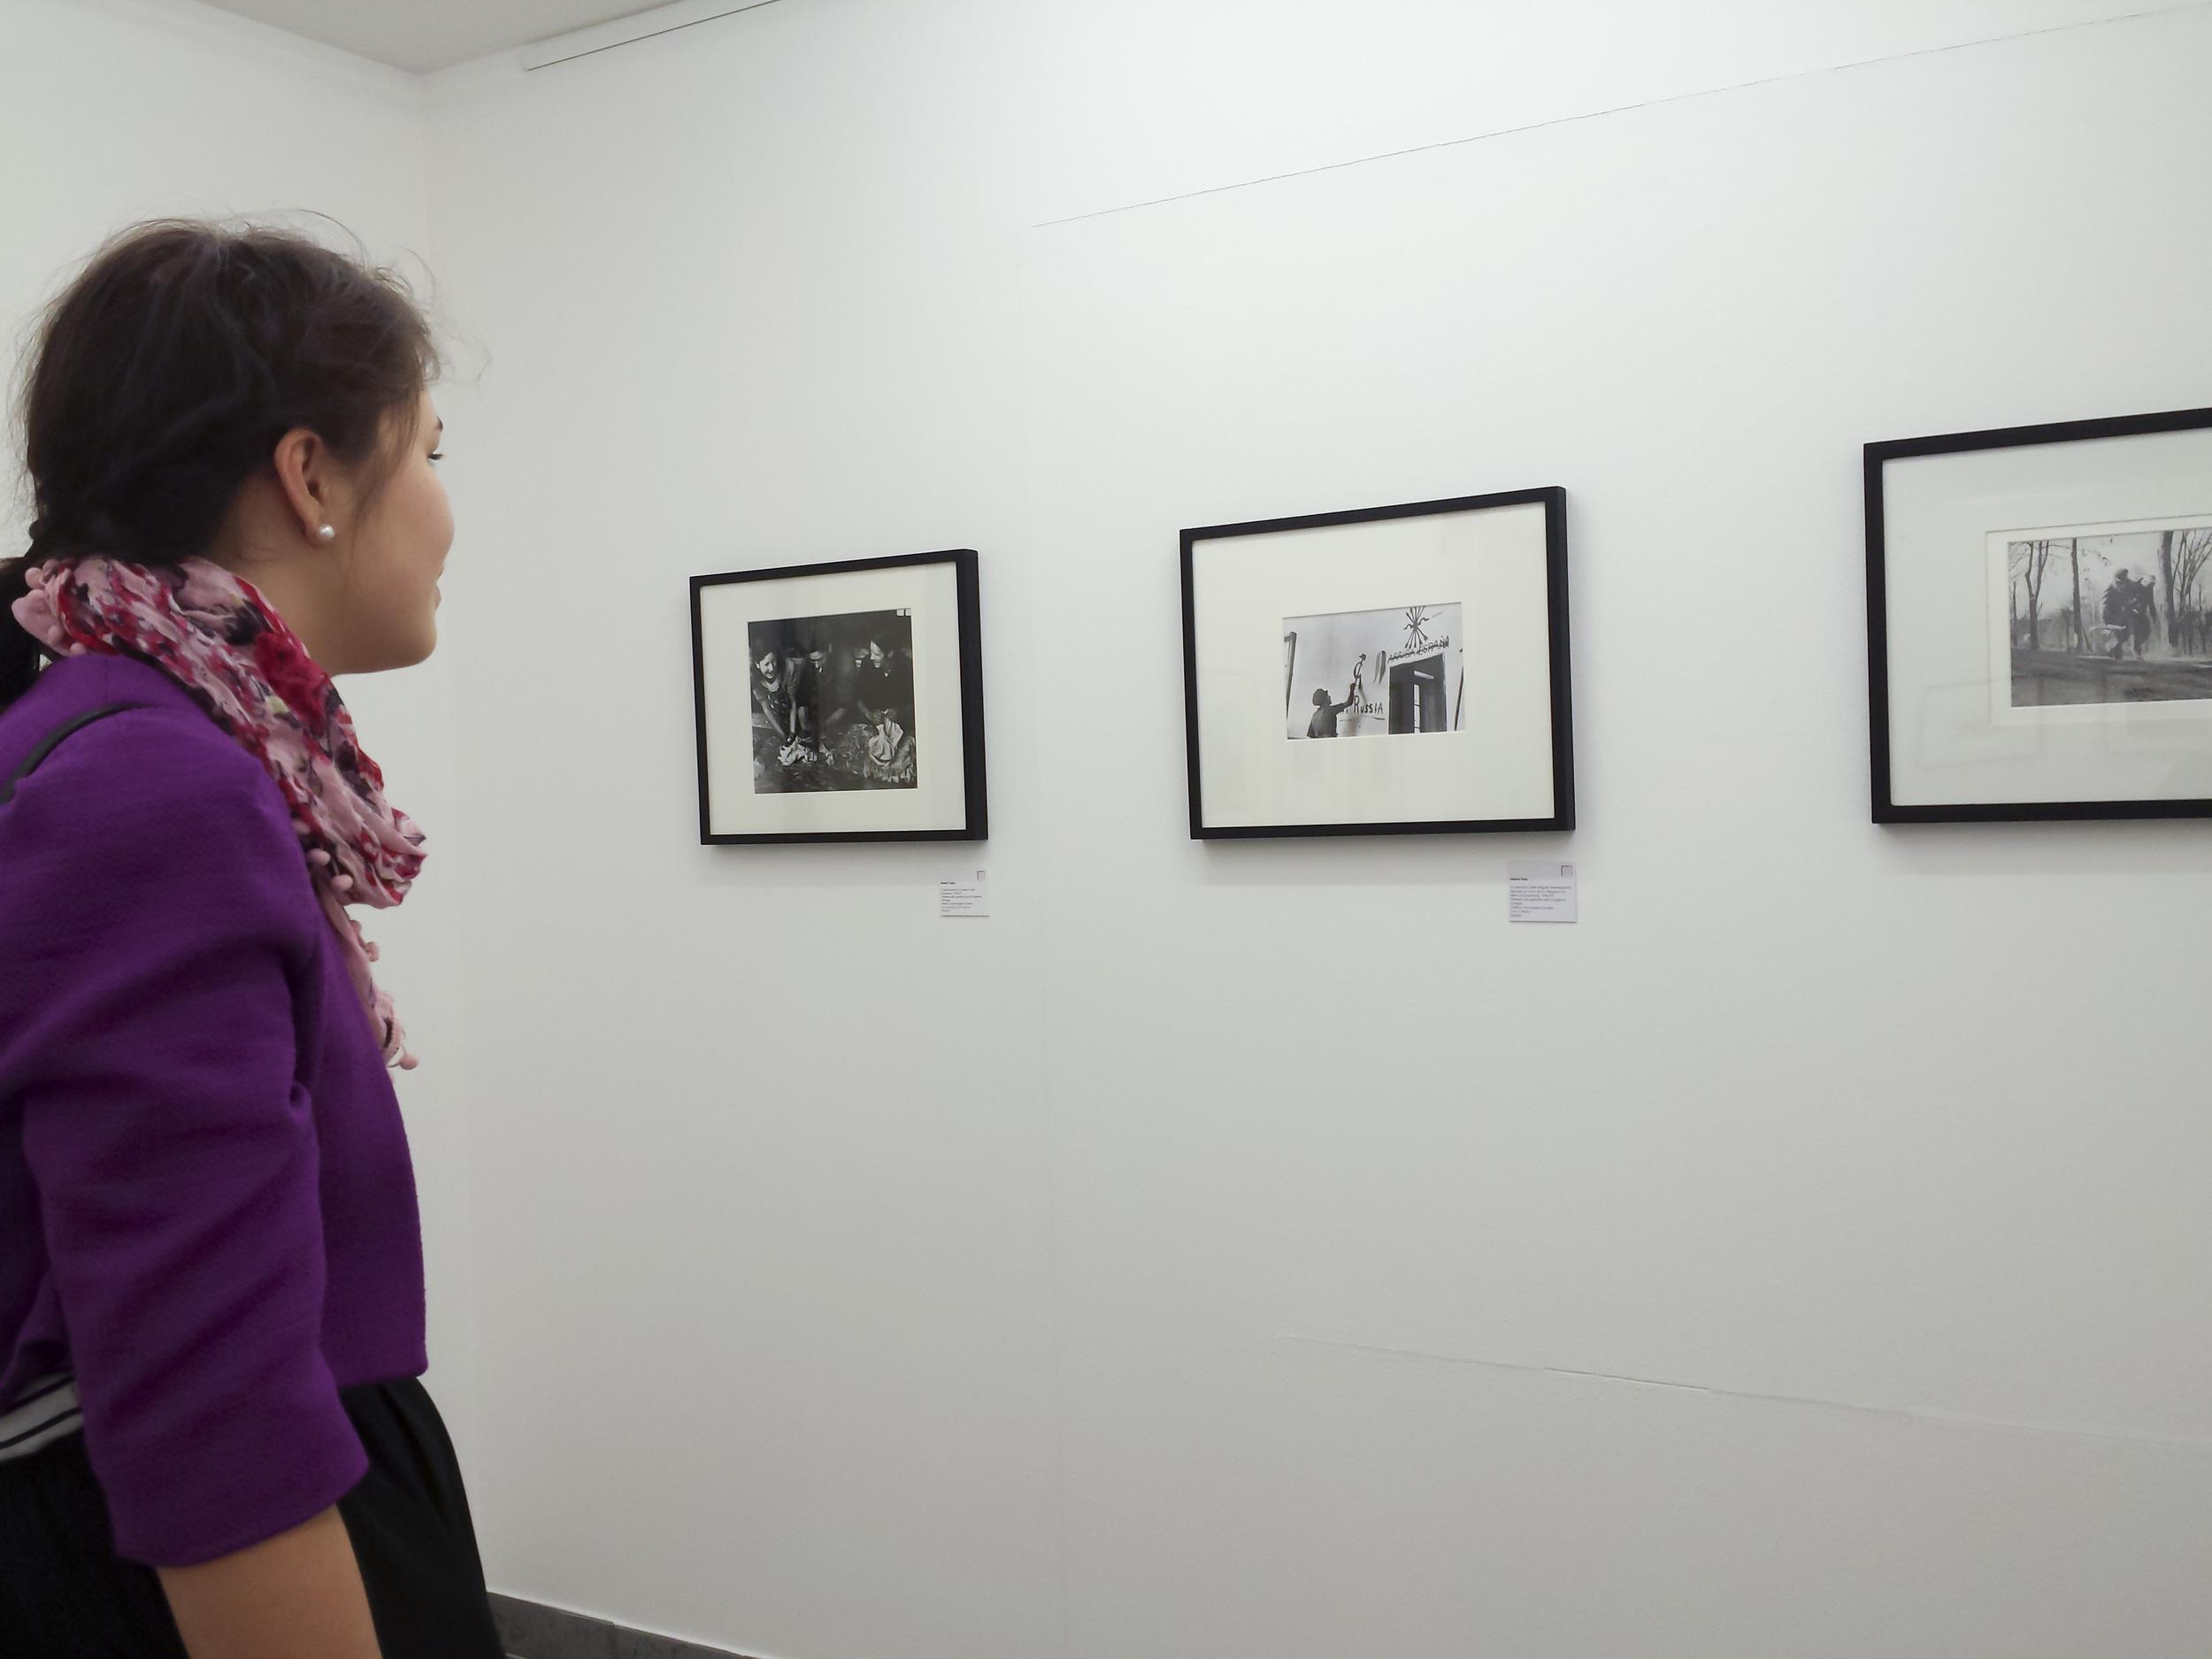 Robert Capa photographs on display in Lugano.